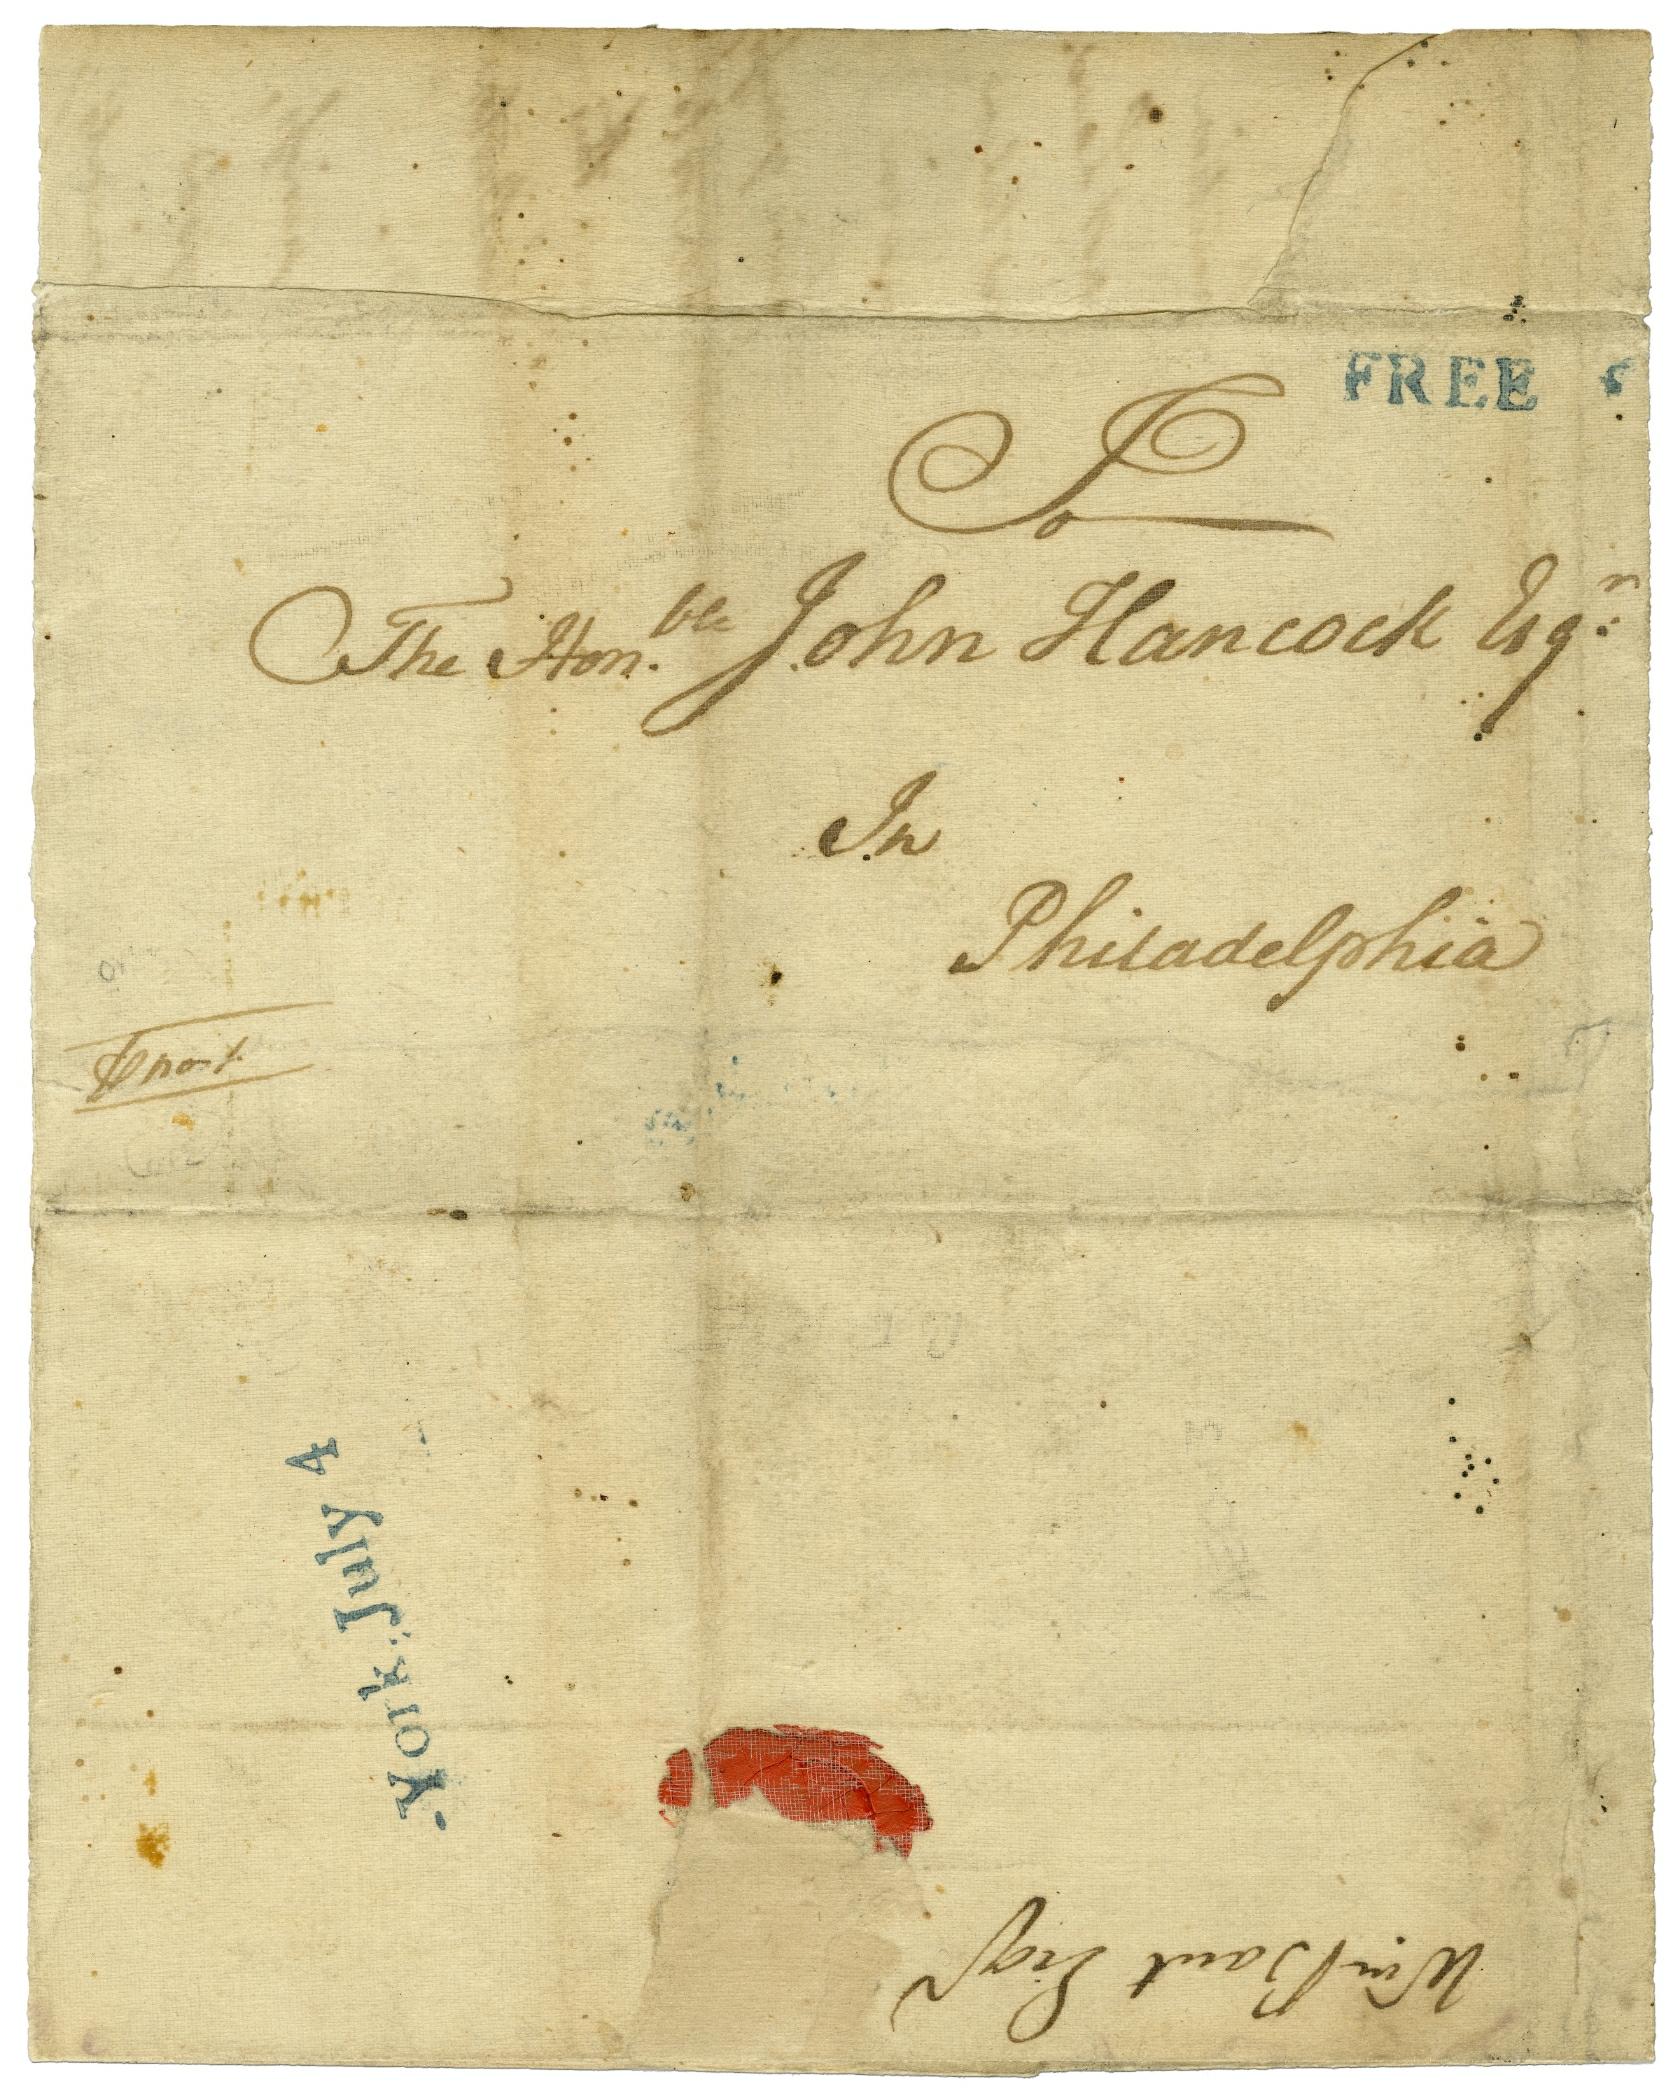 July 4, 1776, John Hancock cover | Smithsonian Institution